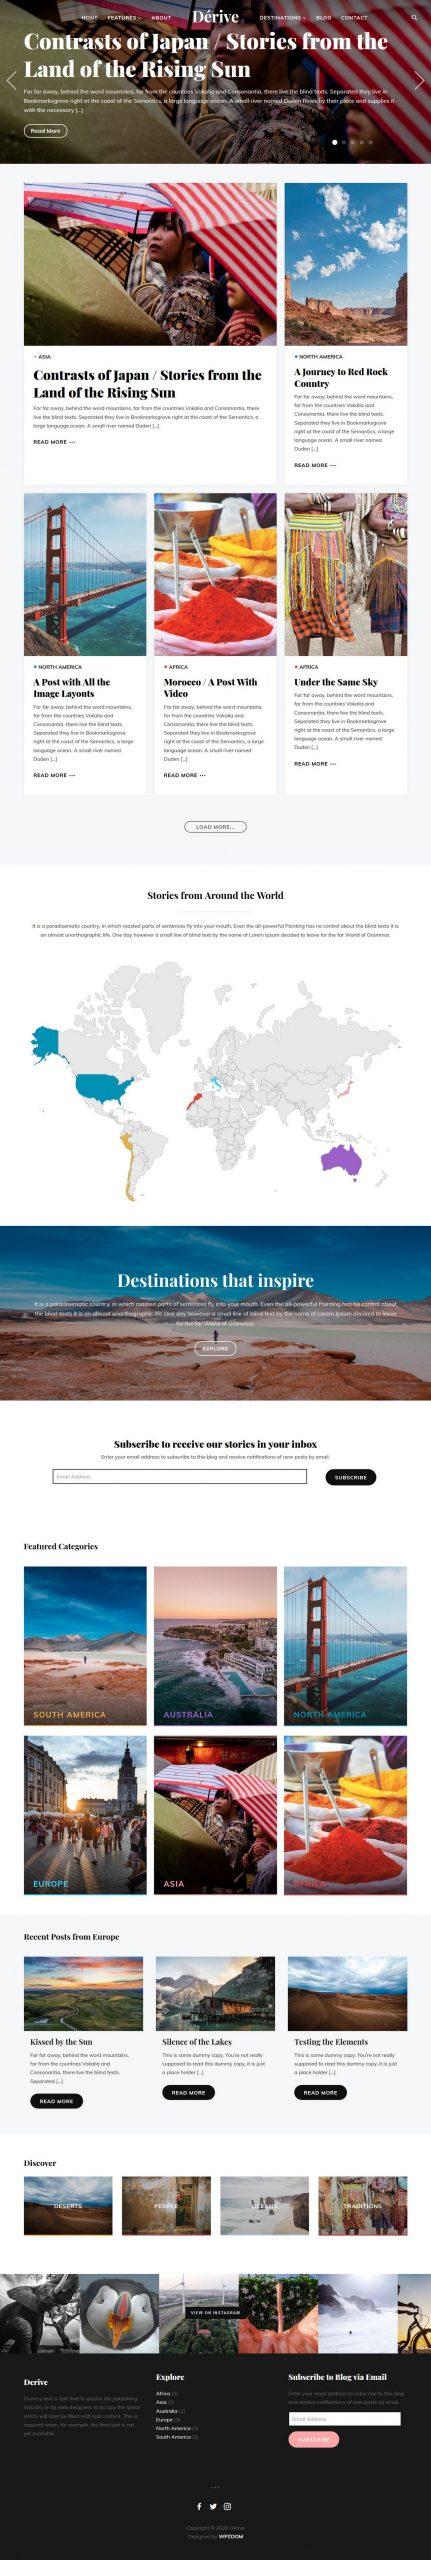 dérive–wordpress theme 01 scaled - Dérive WordPress Theme